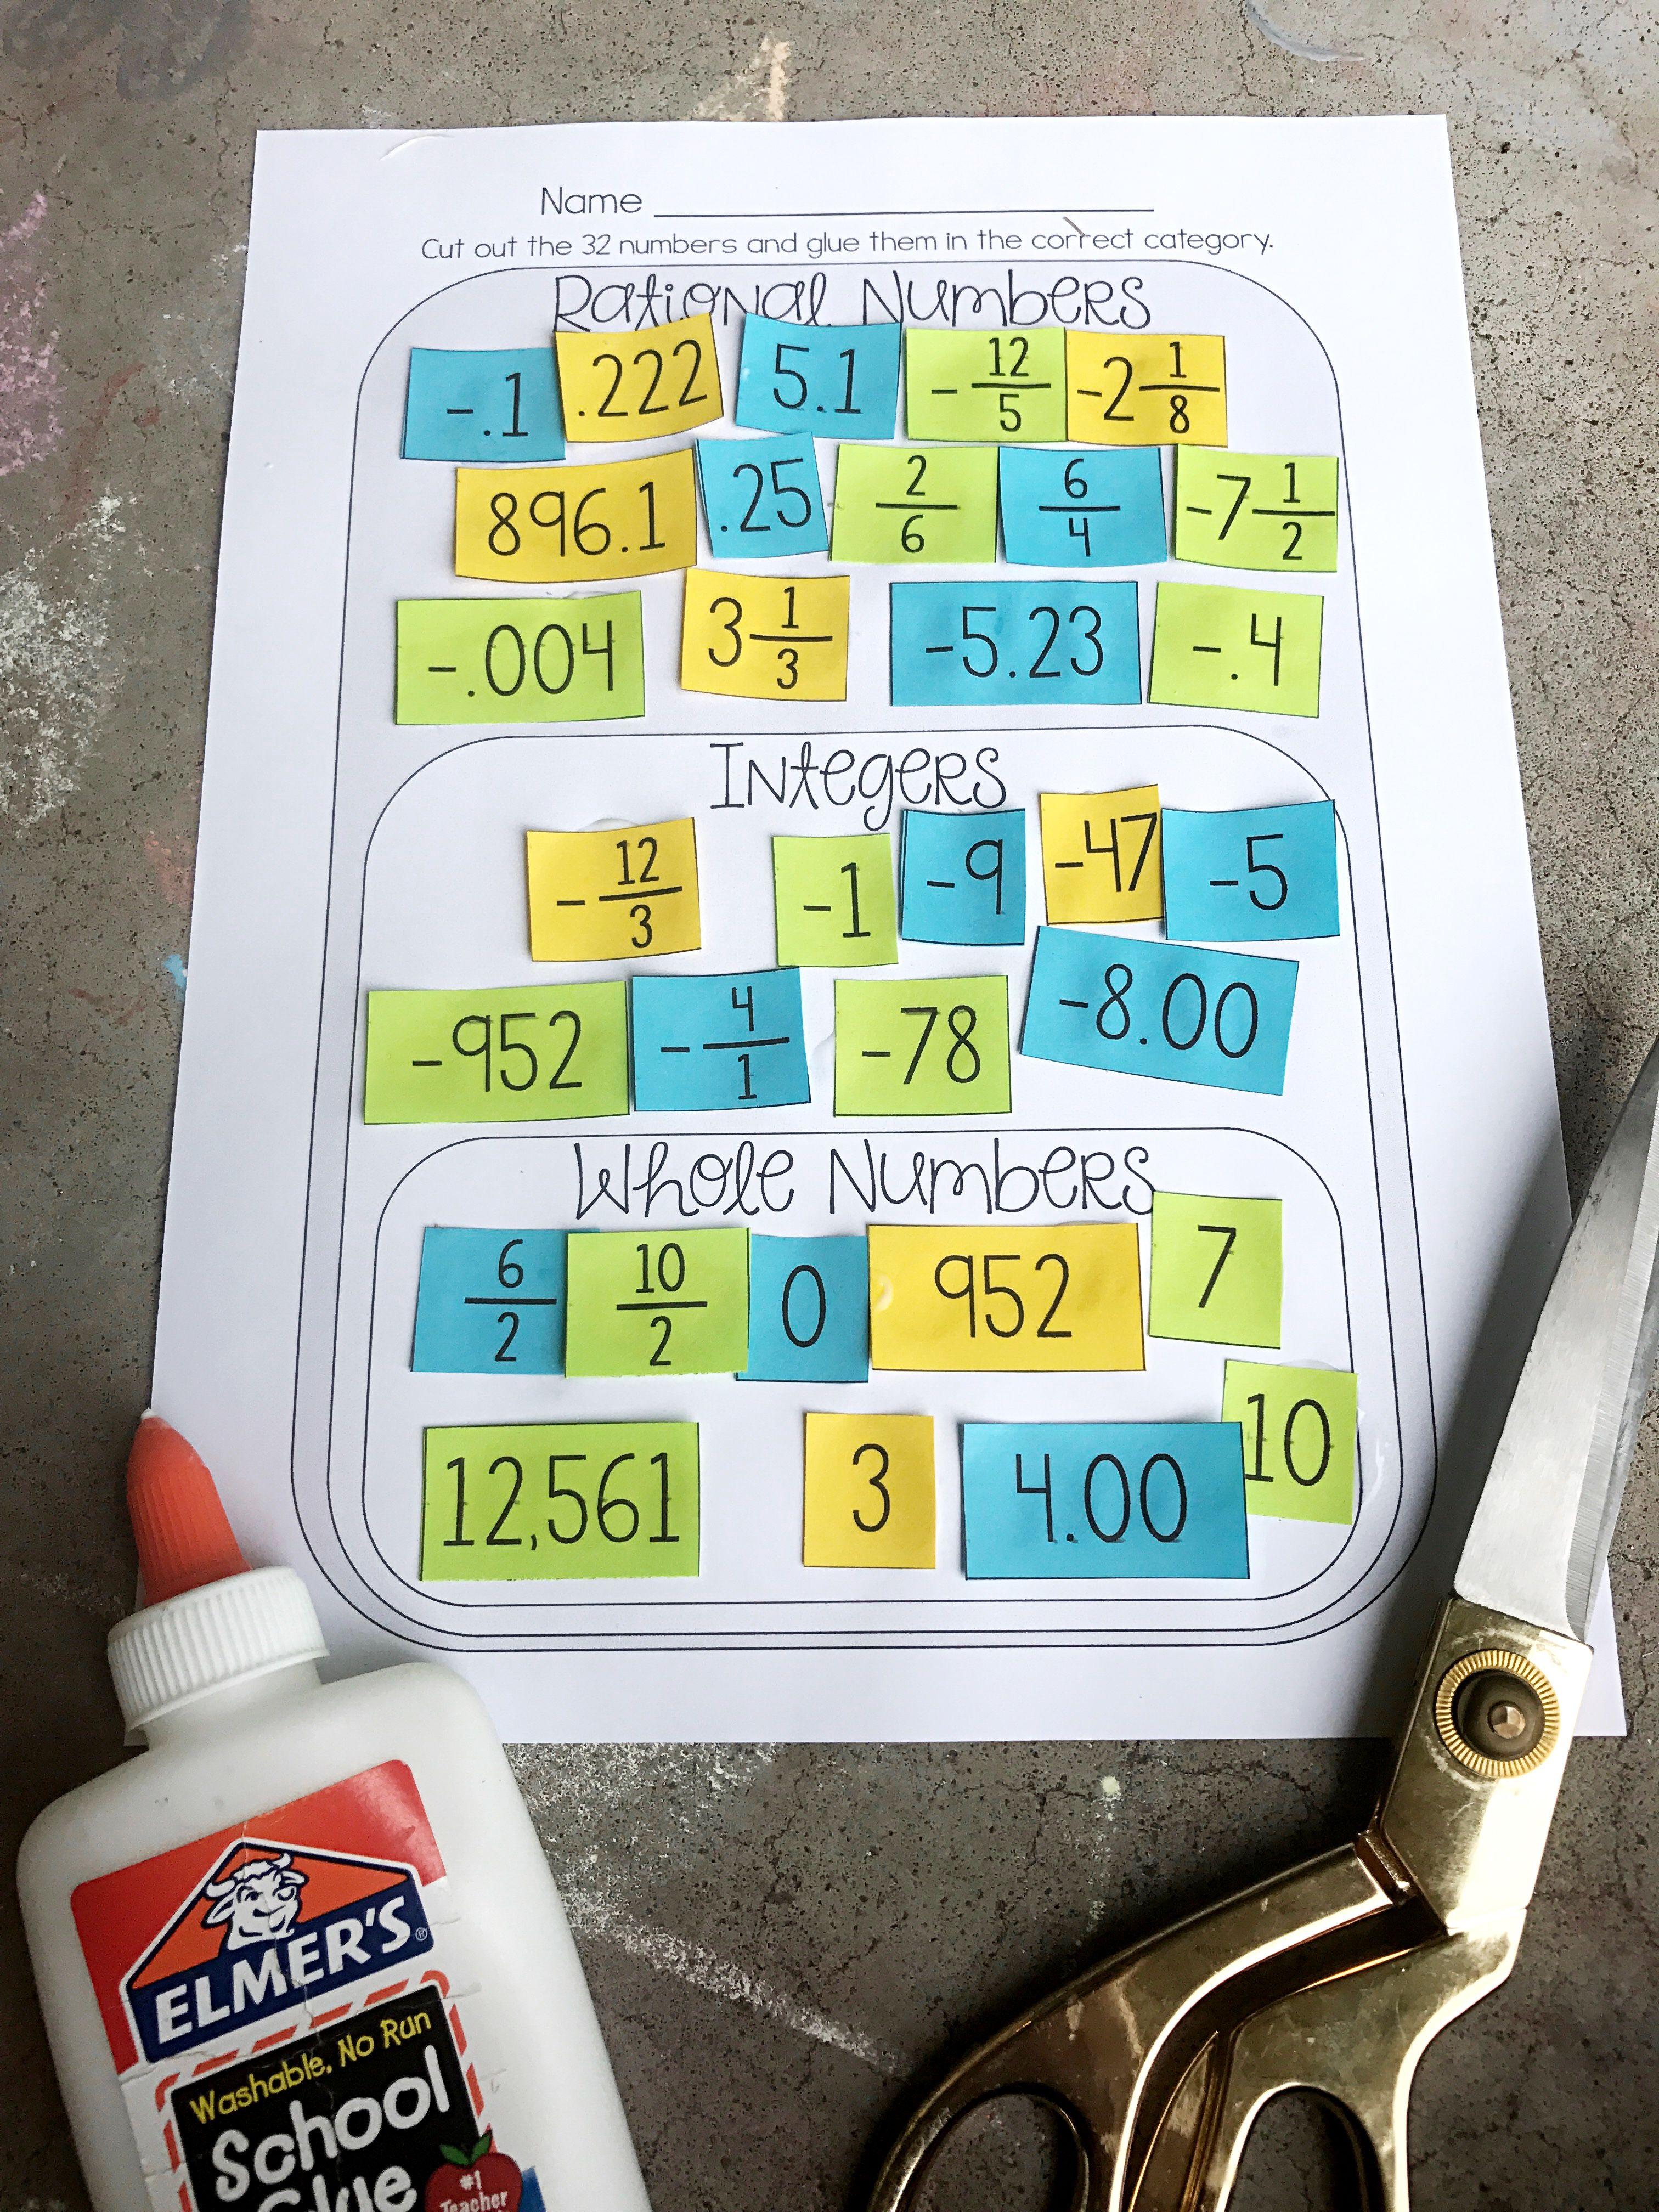 Classifying Rational Numbers Card Sort Rational Whole Integers Rational Numbers Sorting Cards 7th Grade Math Worksheets